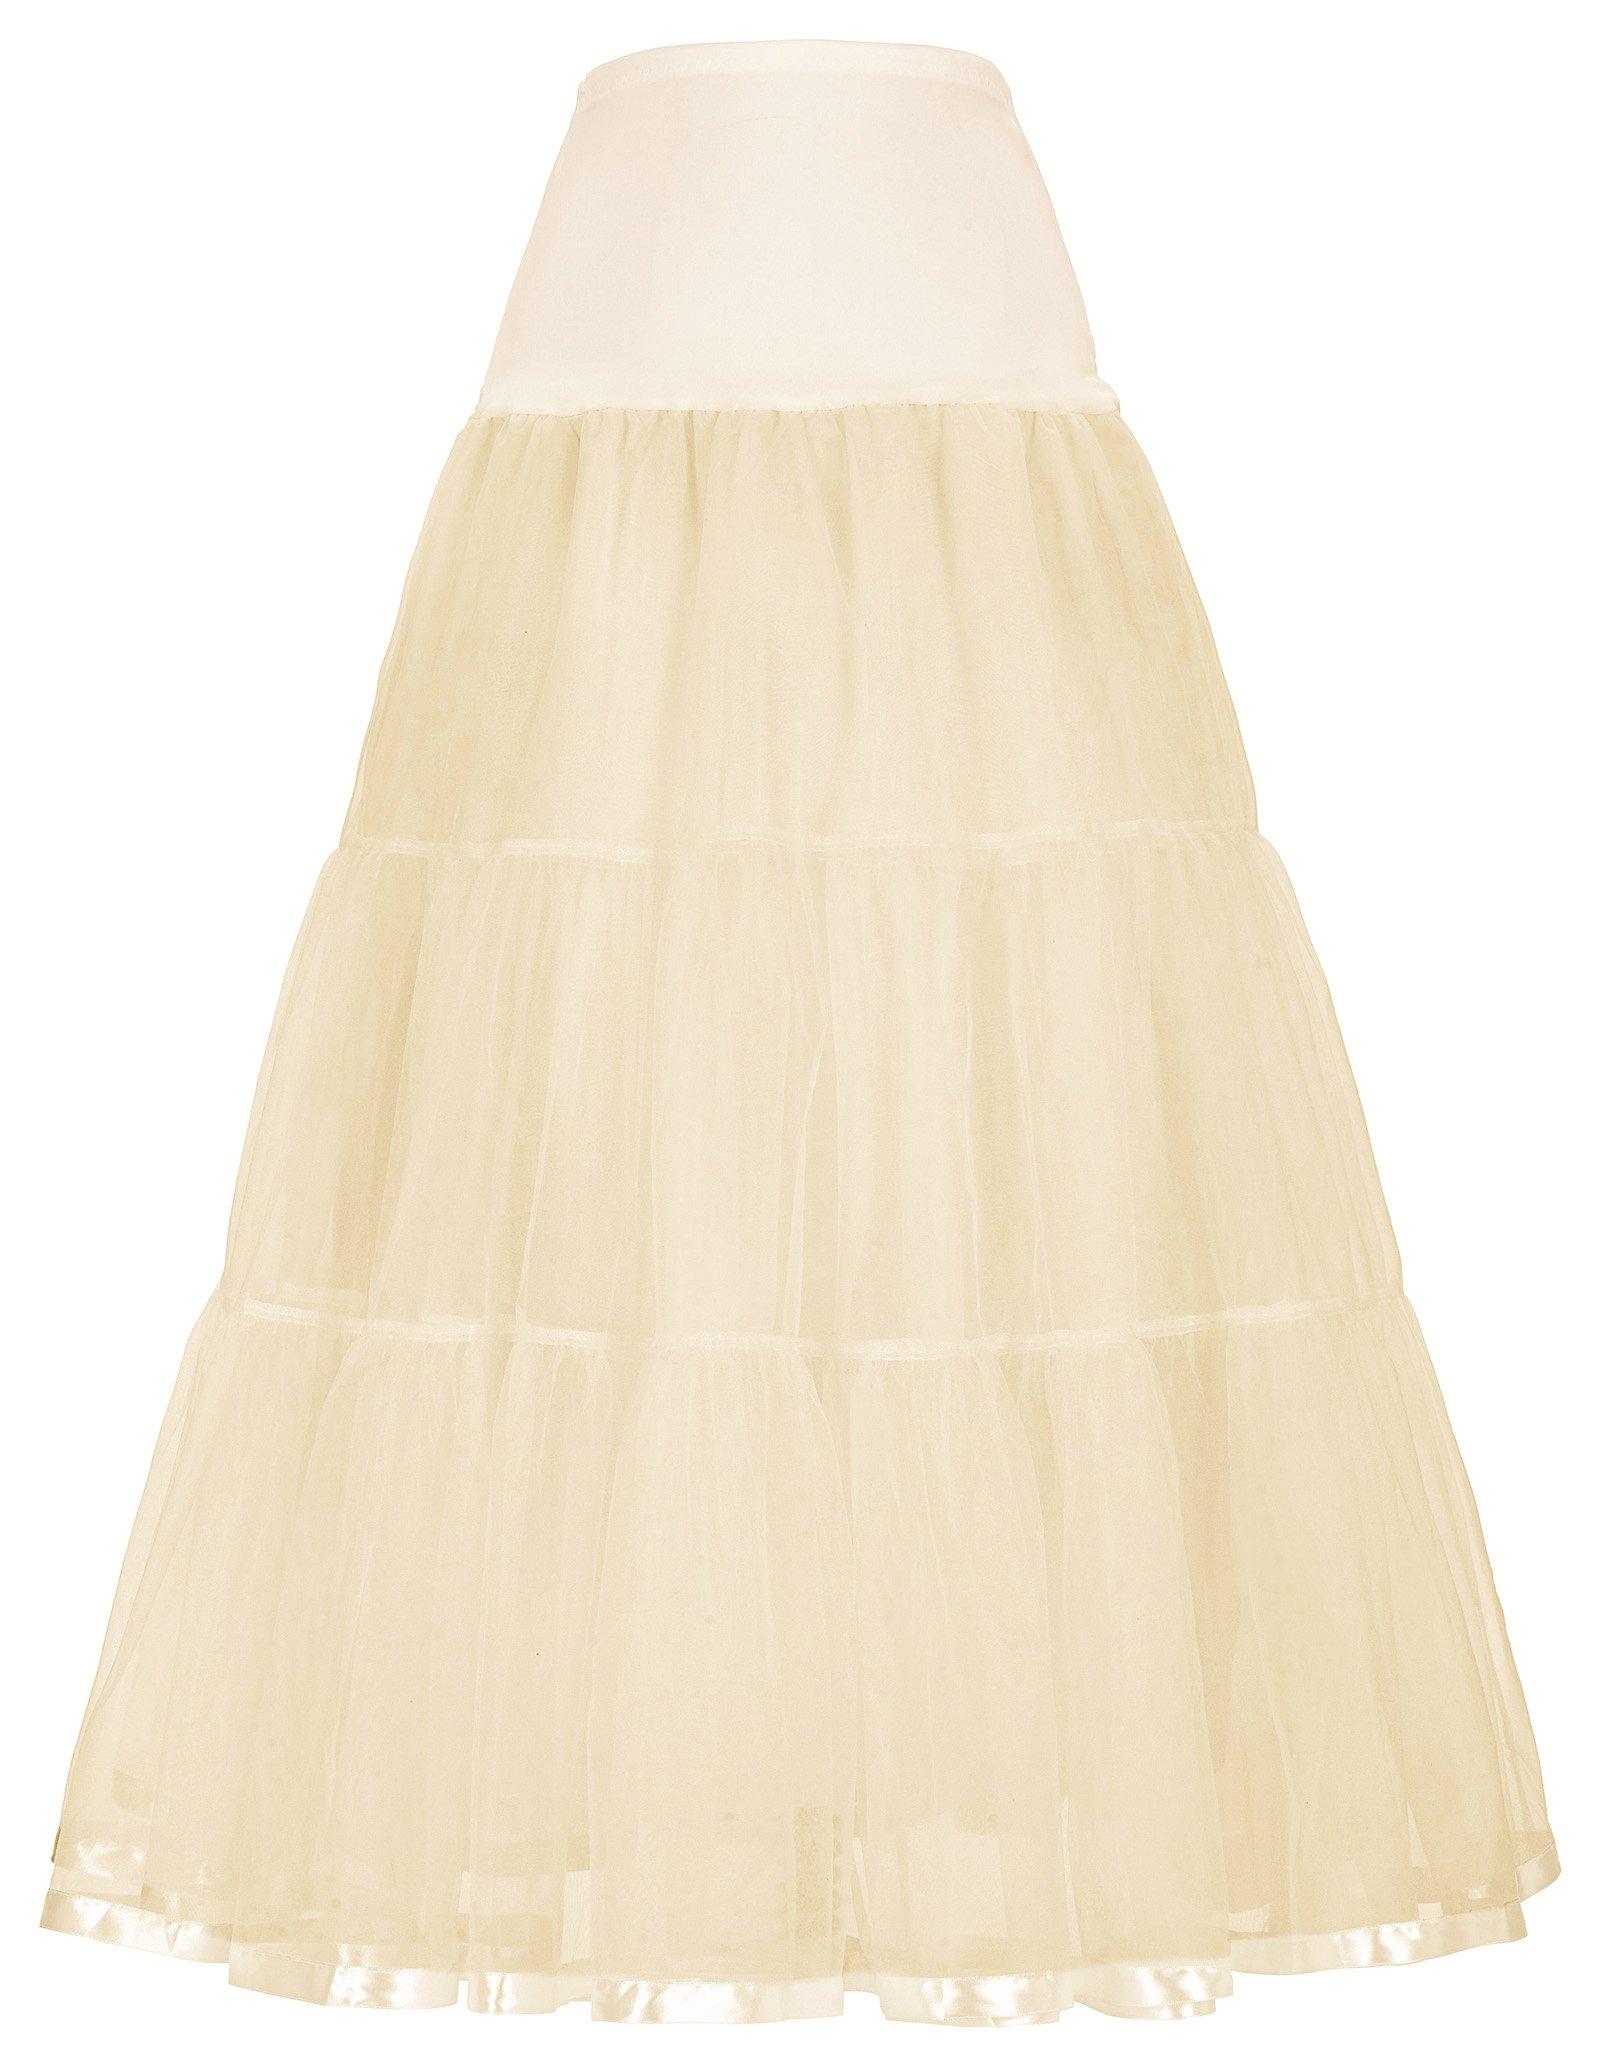 GRACE KARIN Women 50s Underskirt Long Petticoat Wedding Evening Gowns Crinoline Half Slips 8 Colors S-Plus Size 4XL